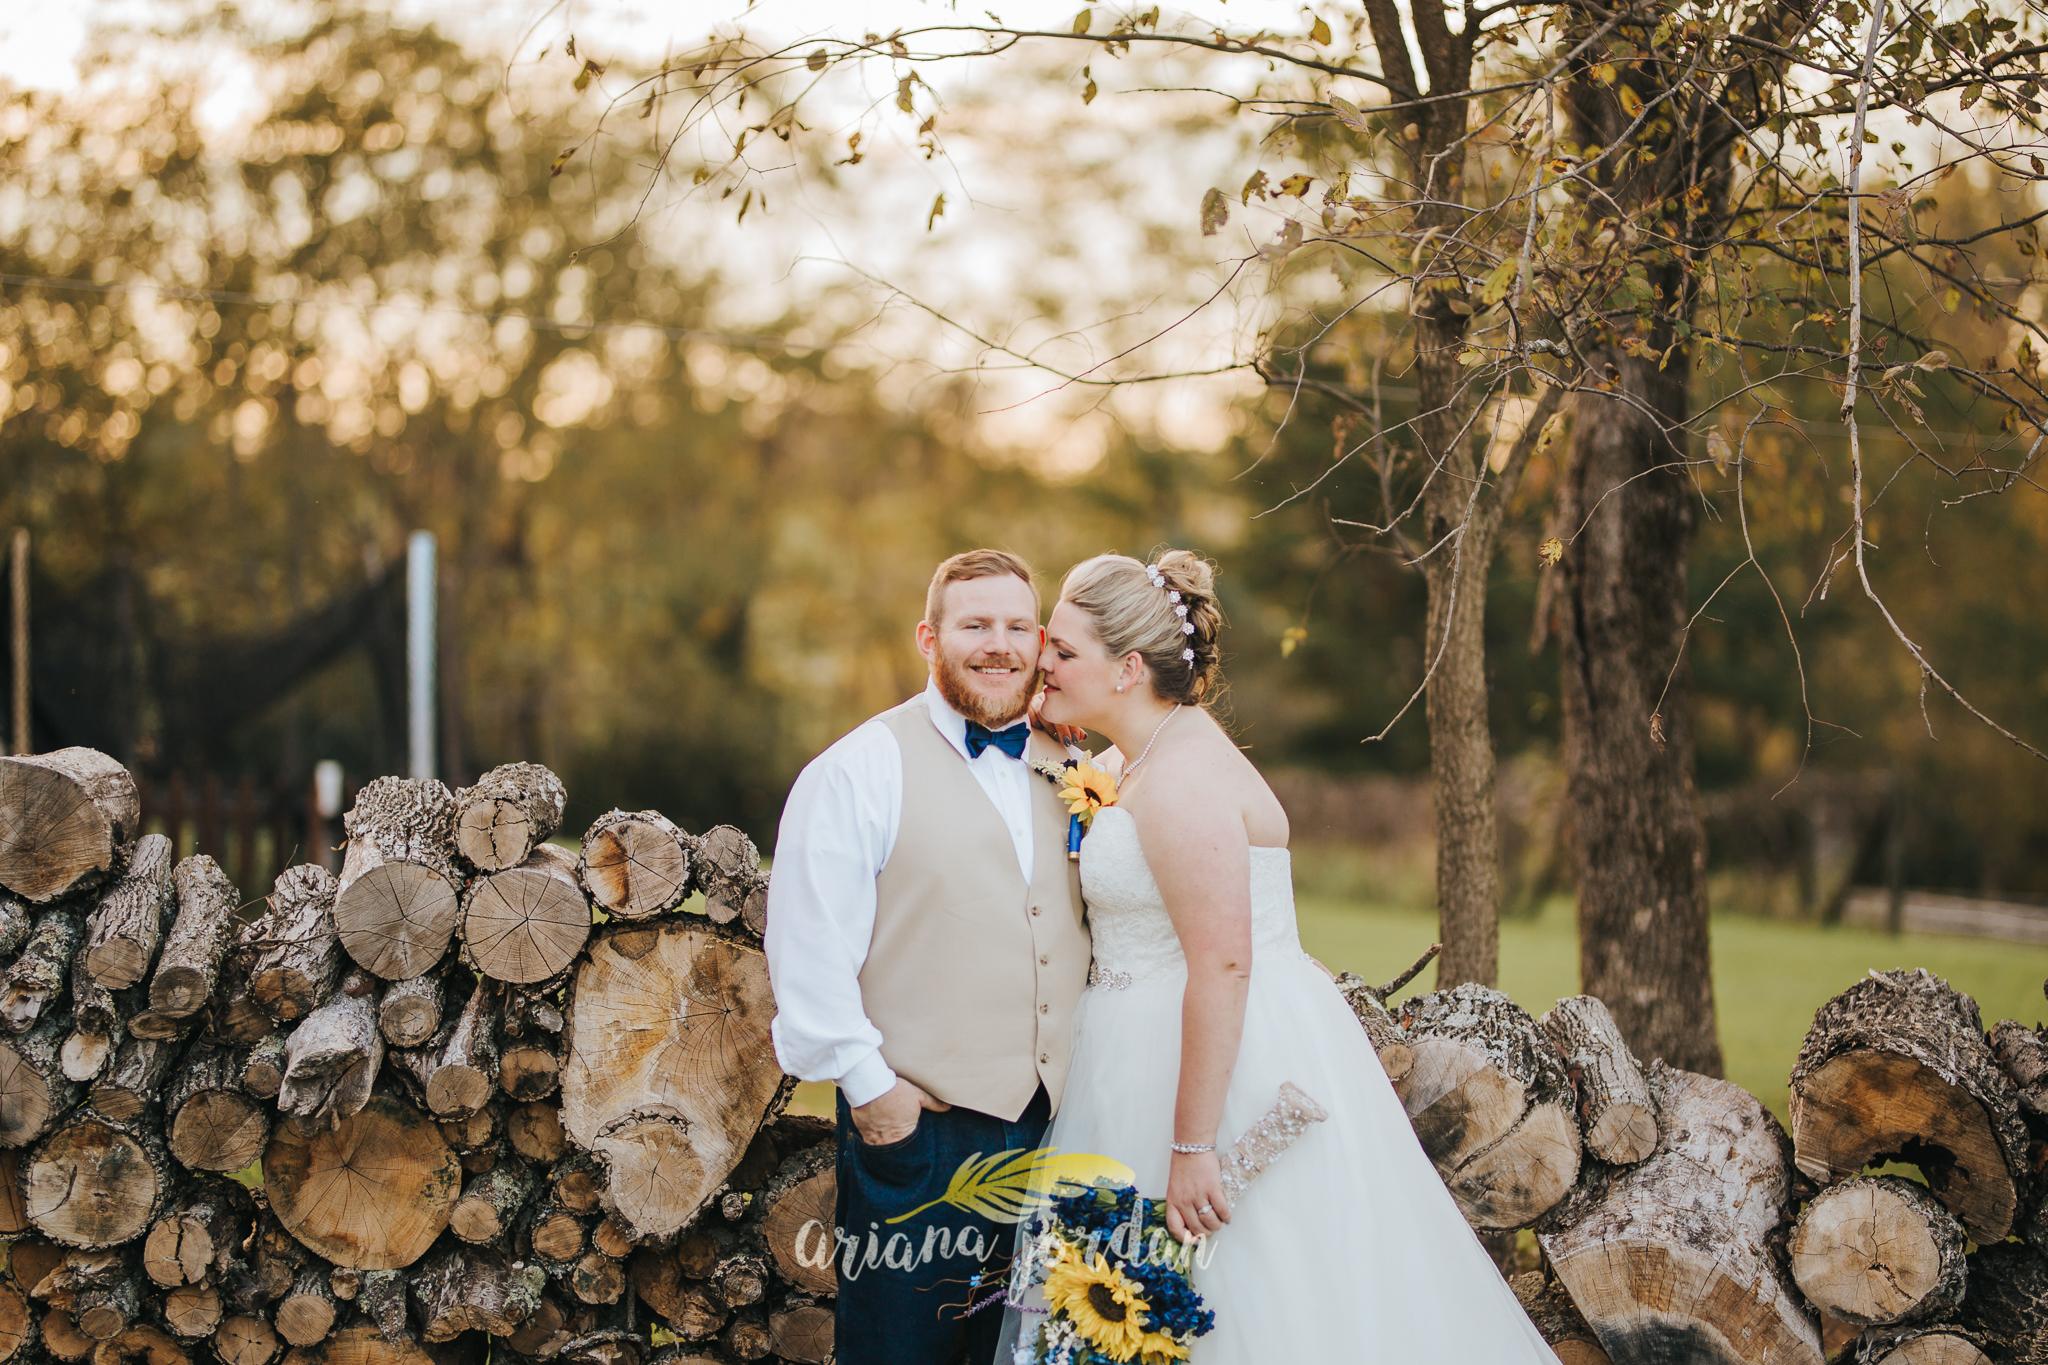 0091 Ariana Jordan Photography - Georgetown KY Wedding Photographer 6969.jpg